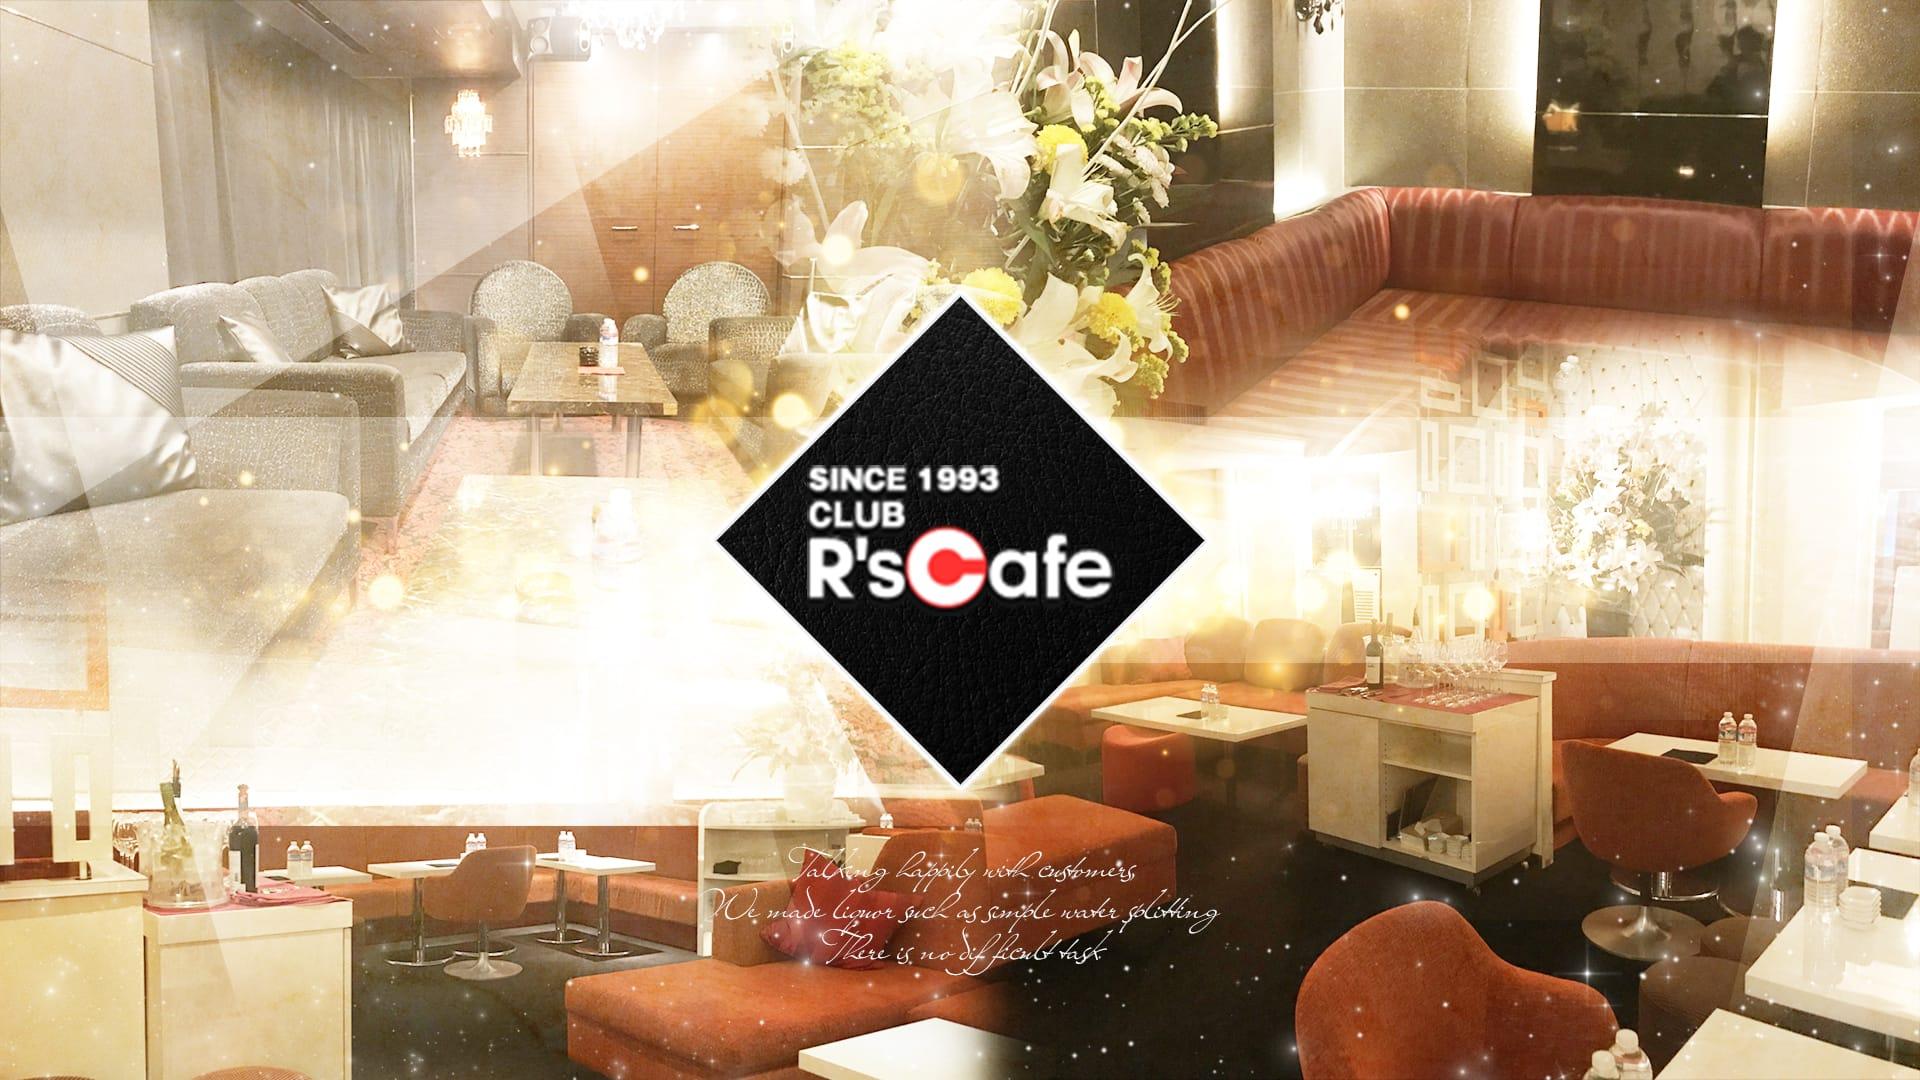 R's Cafe~アールズカフェ~ 銀座キャバクラ TOP画像